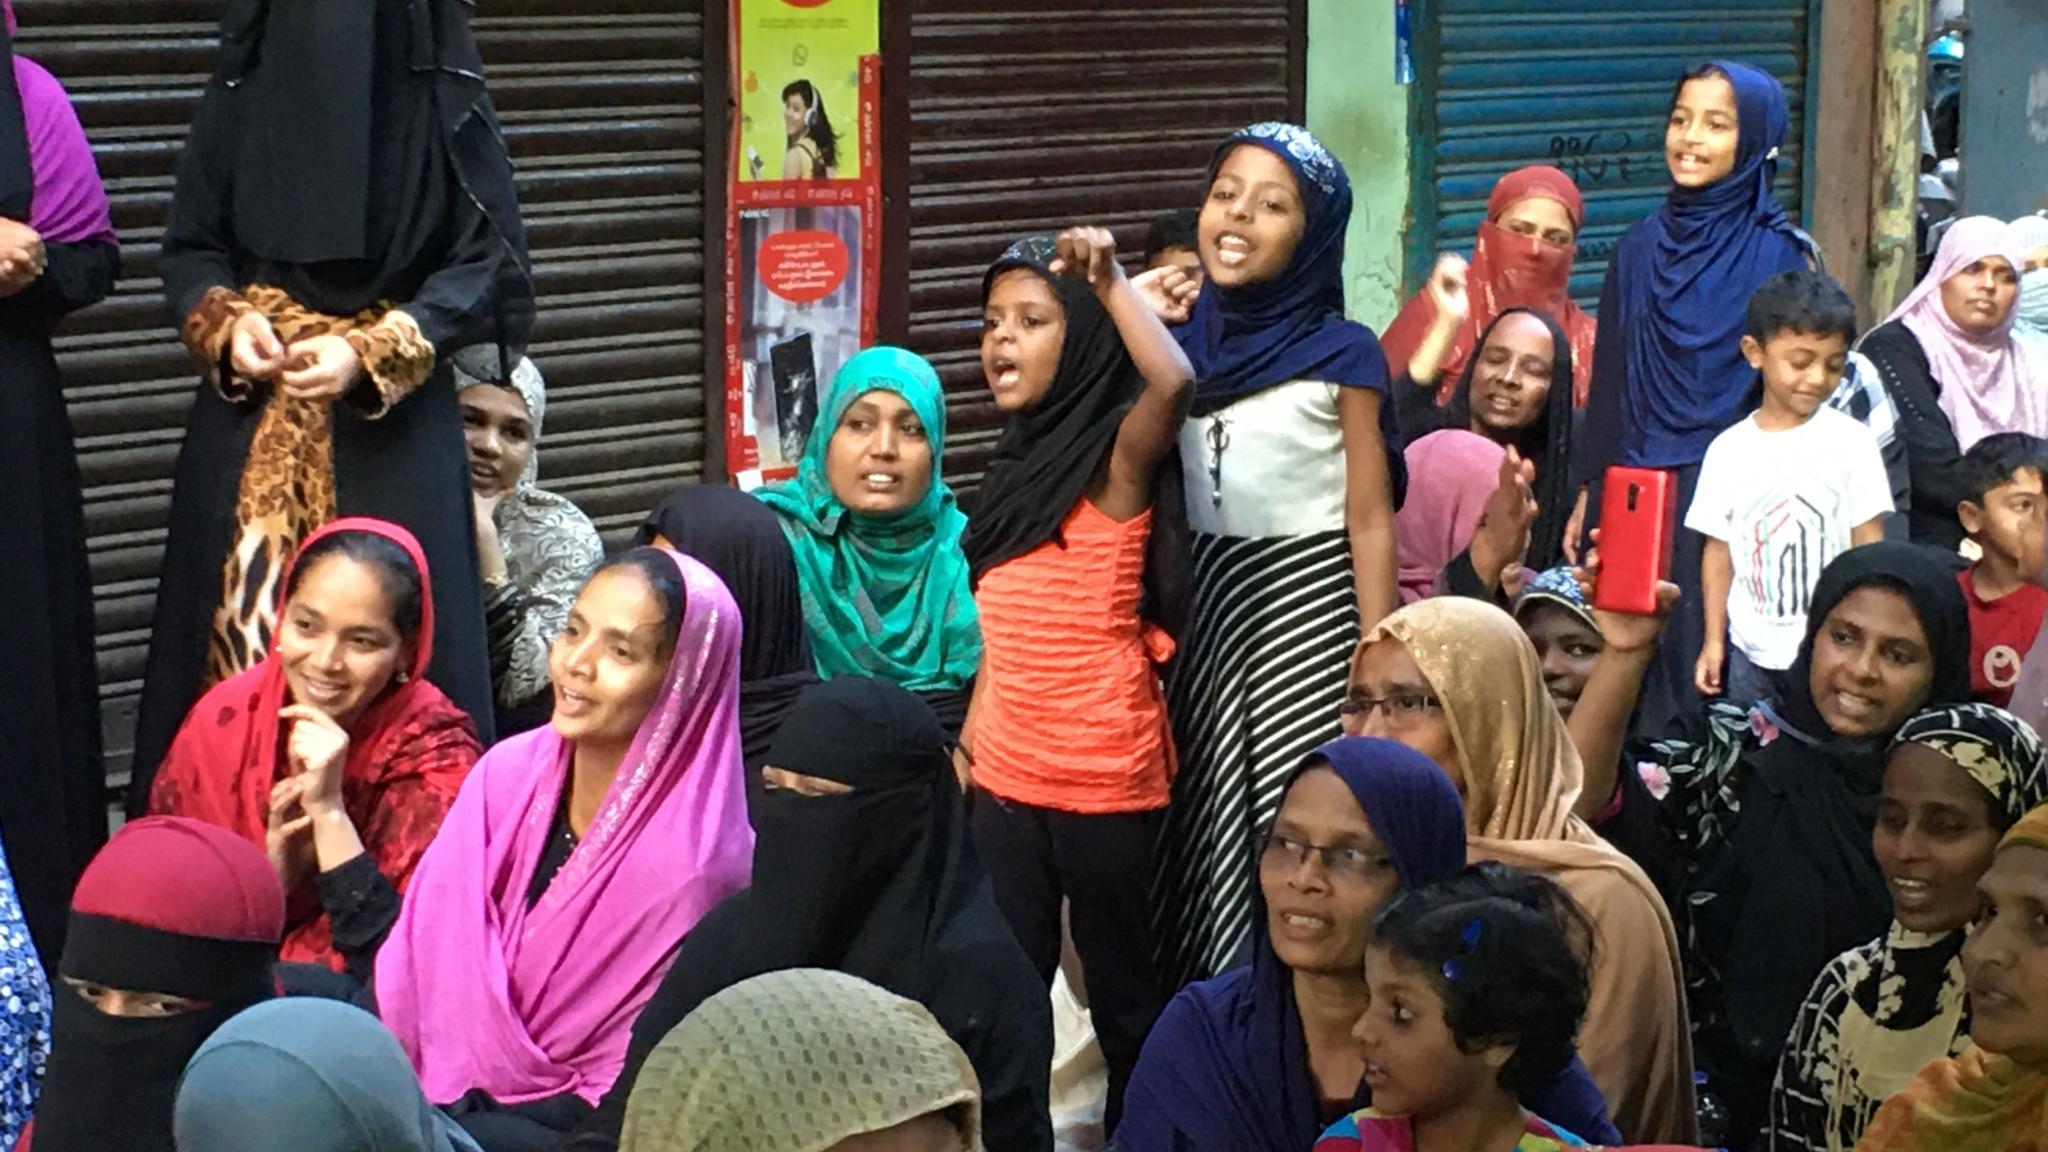 In Pics: Chennai's Own Shaheen Bagh Against CAA – 'Shaheenpet'